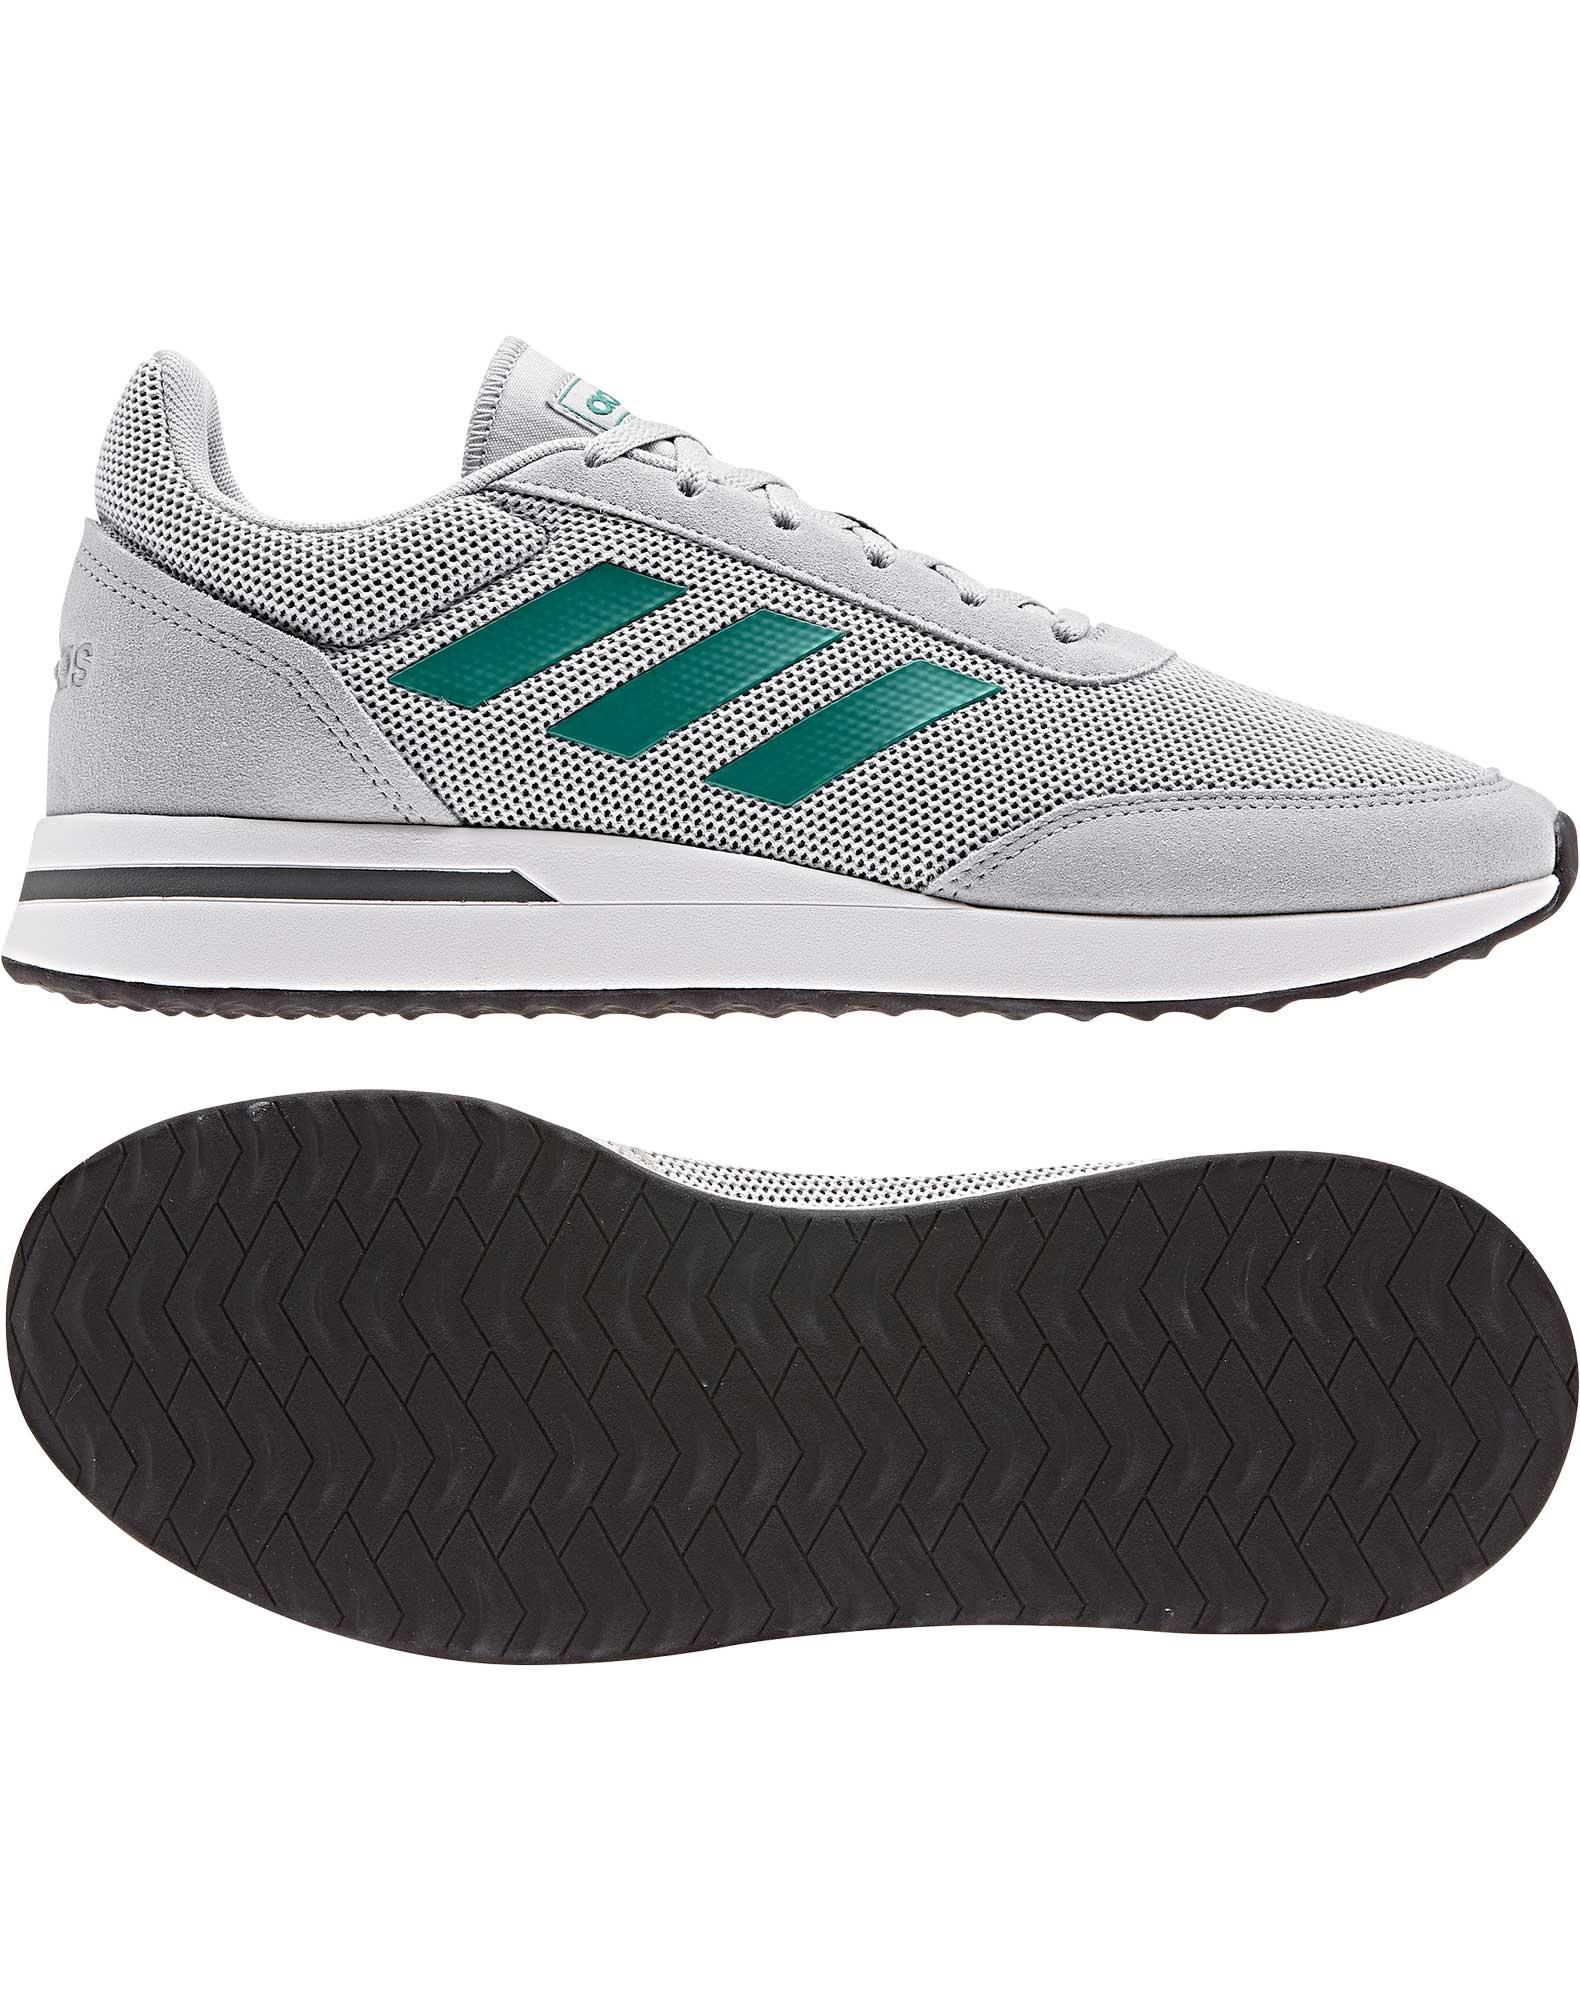 Køb Sneakers Herre Butikker Adidas Swift Run Grå : Save 31%